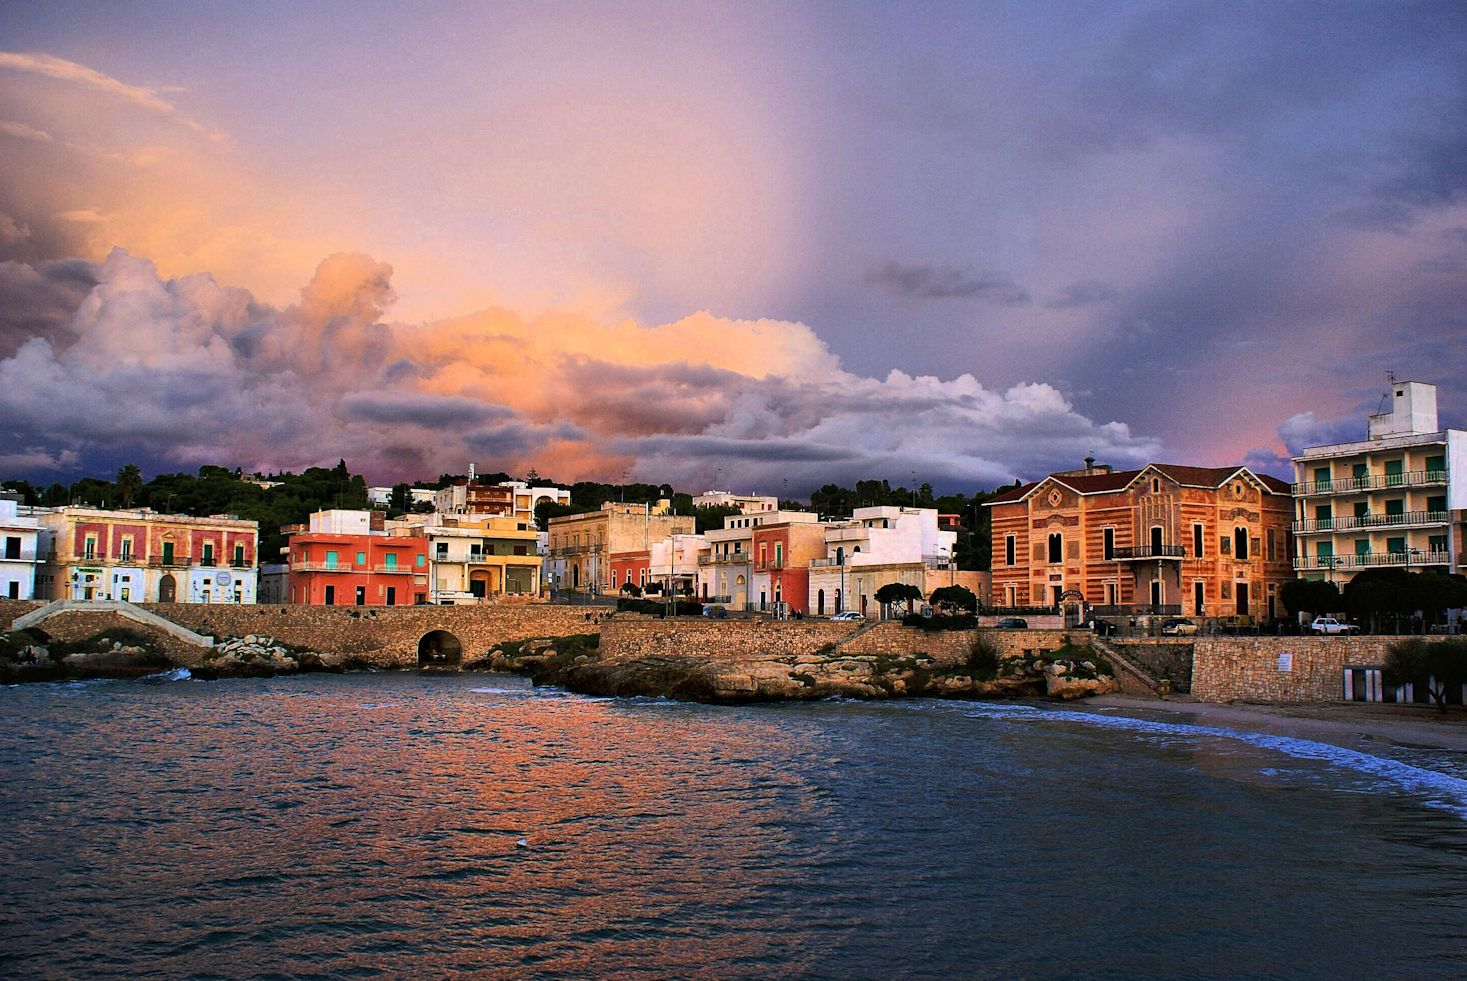 De kustlijn van salento sogno italiano - Santa maria a bagno ...